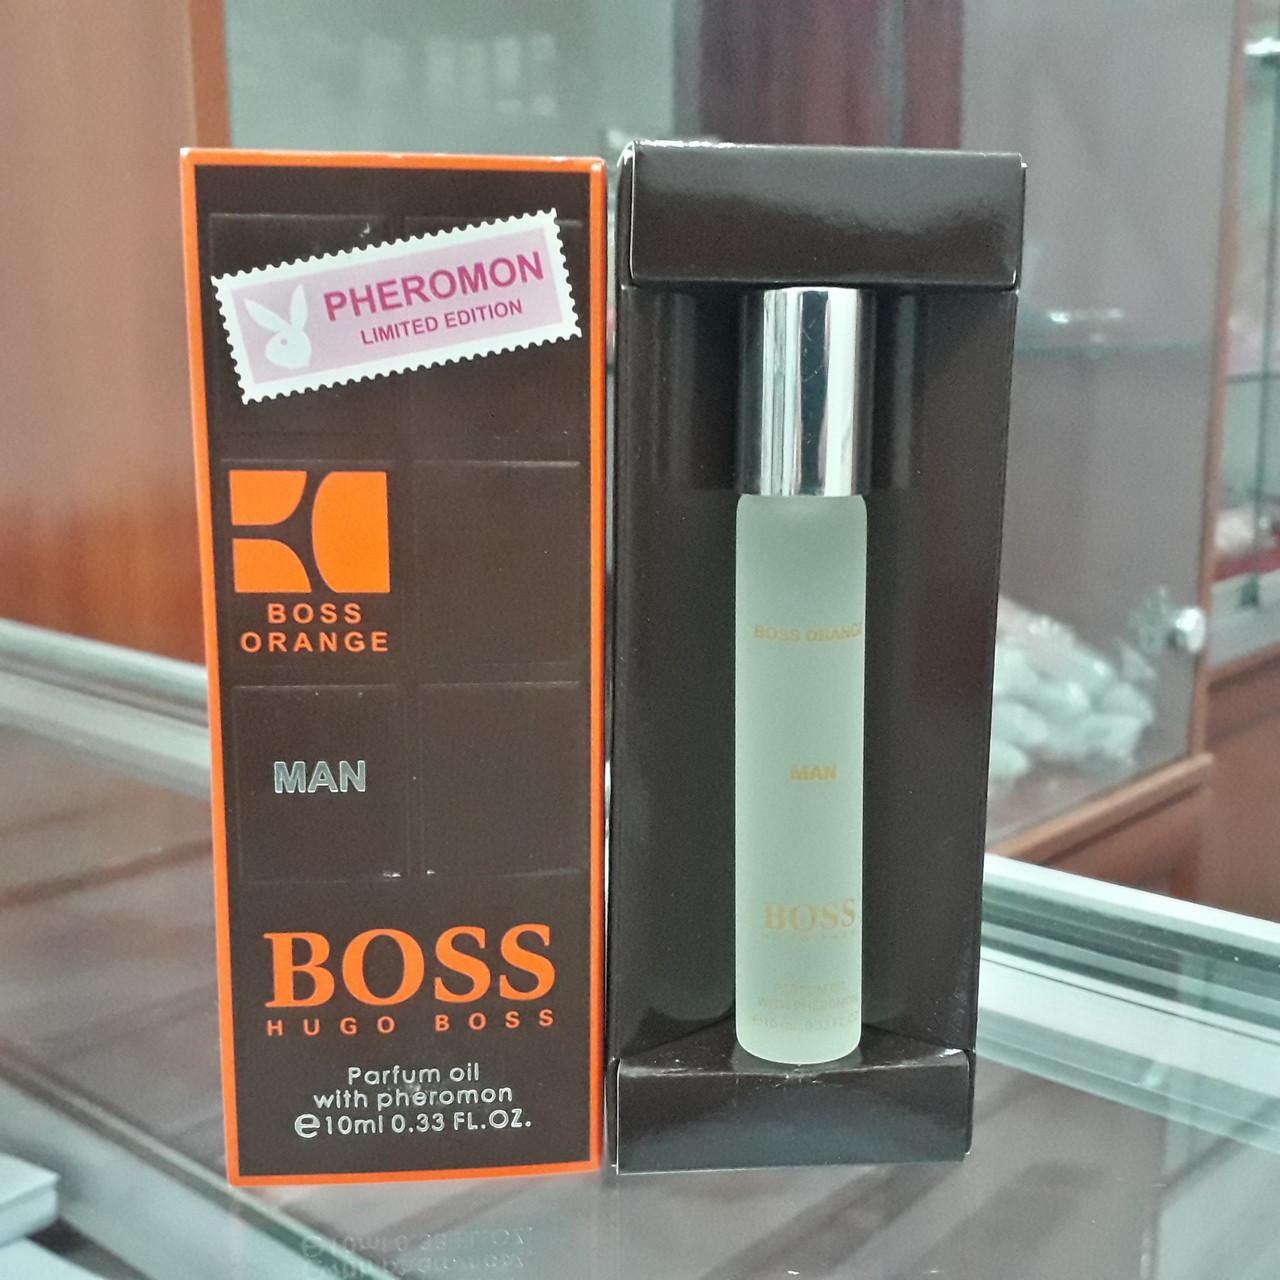 Духи с феромонами Hugo Boss Boss Orange for Men, 10 ml.